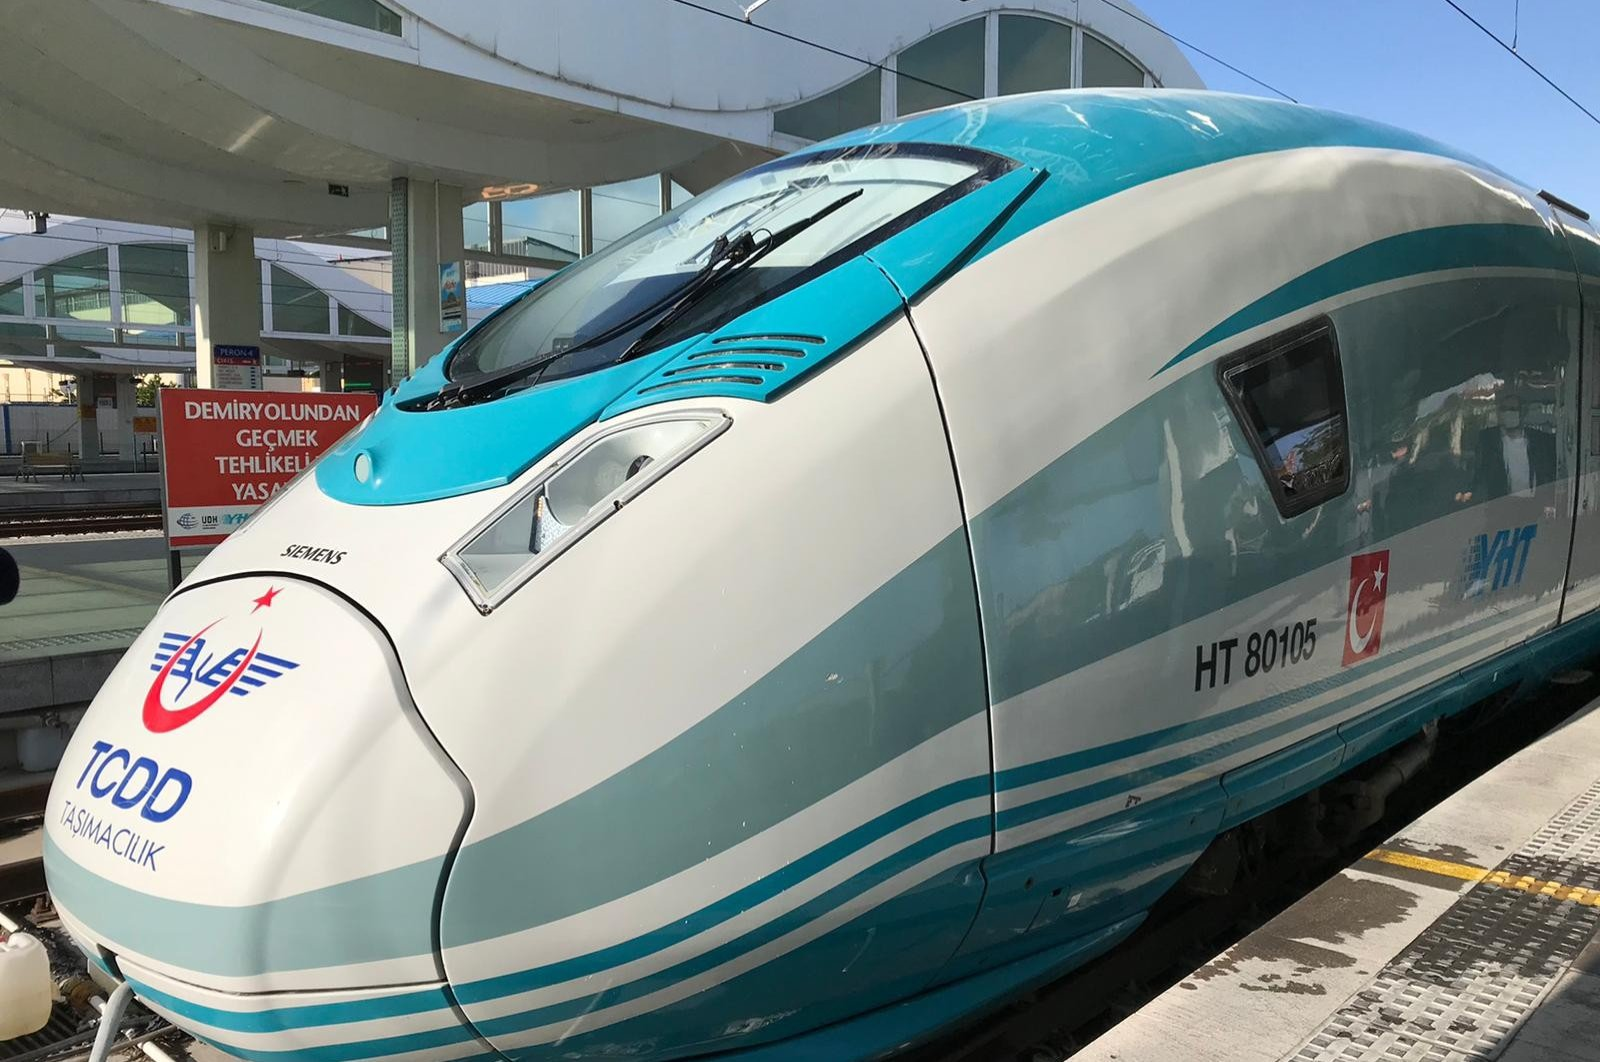 A high-speed train is seen ahead of departure at a train station in Eskişehir, Turkey, May 28, 2020. (IHA Photo)